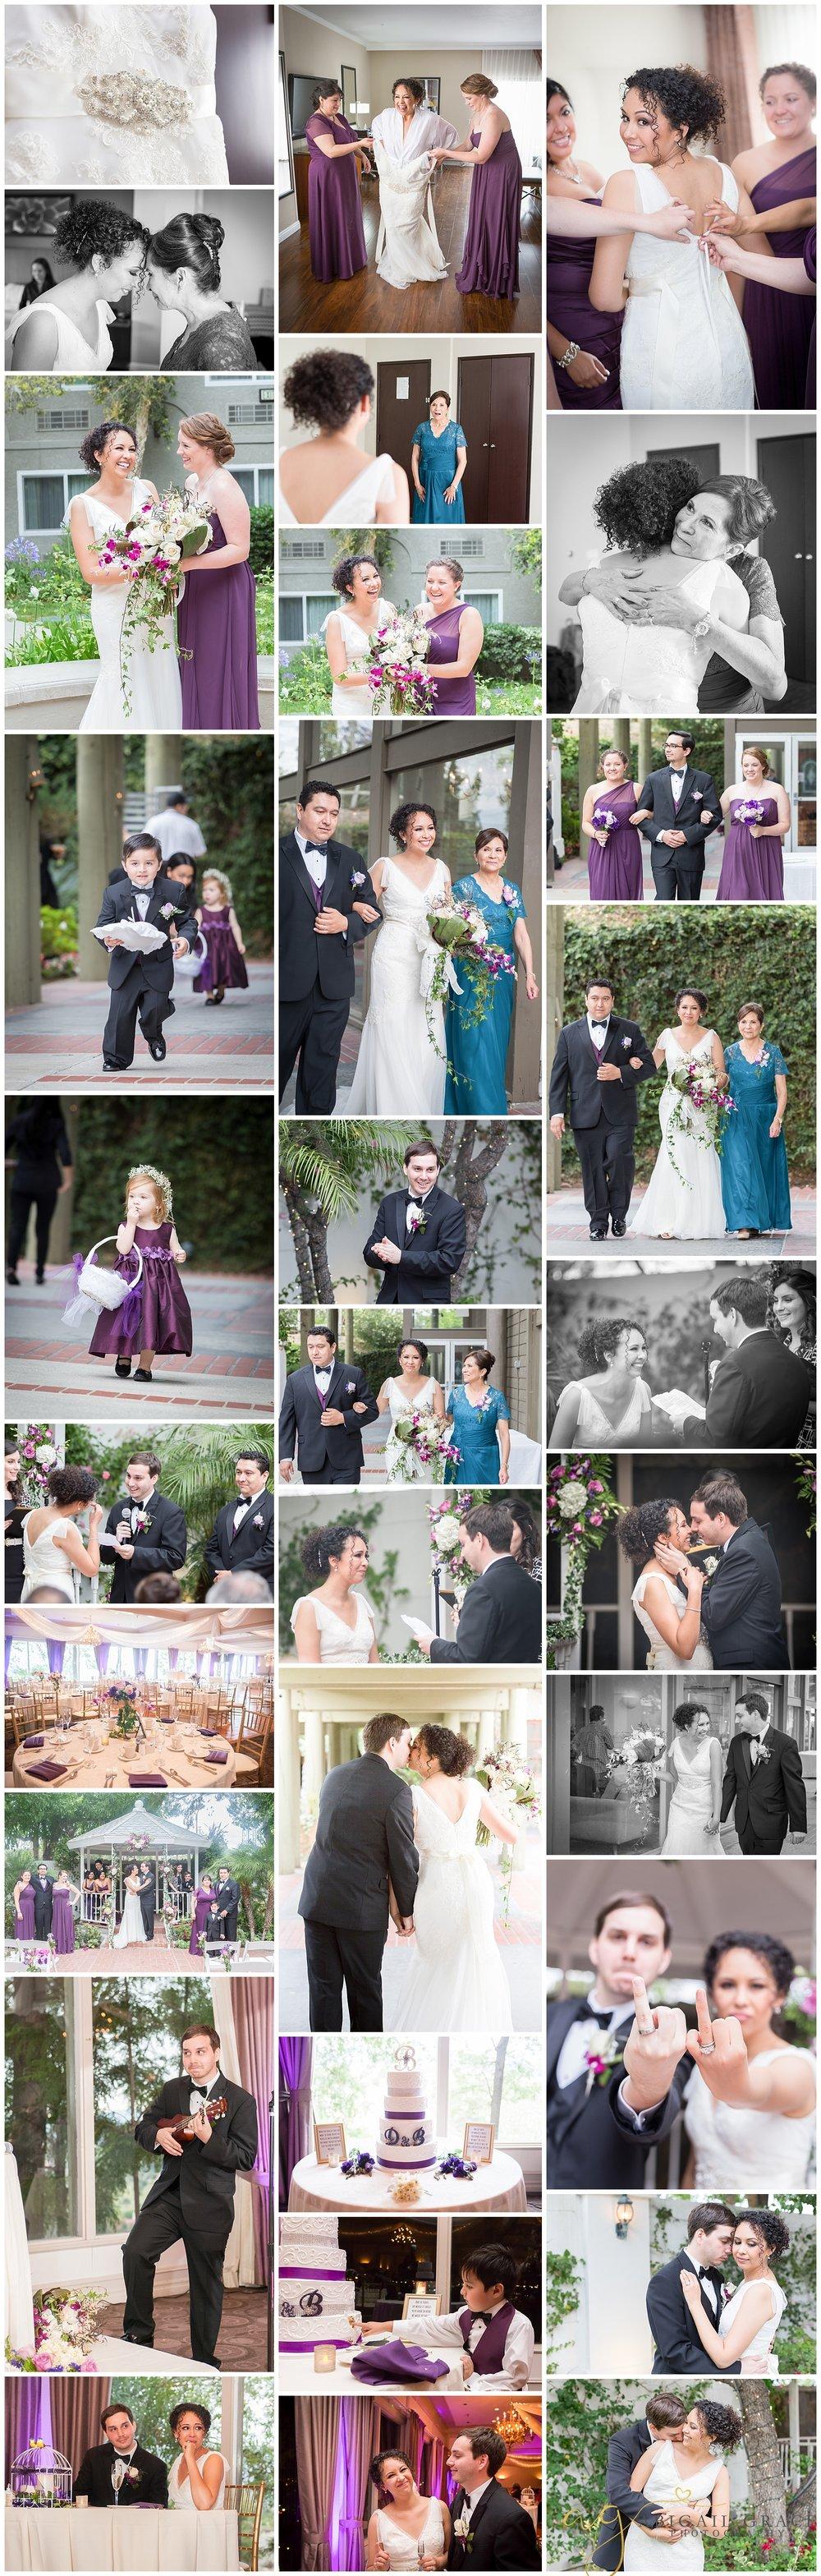 los angeles the odyssey wedding photos